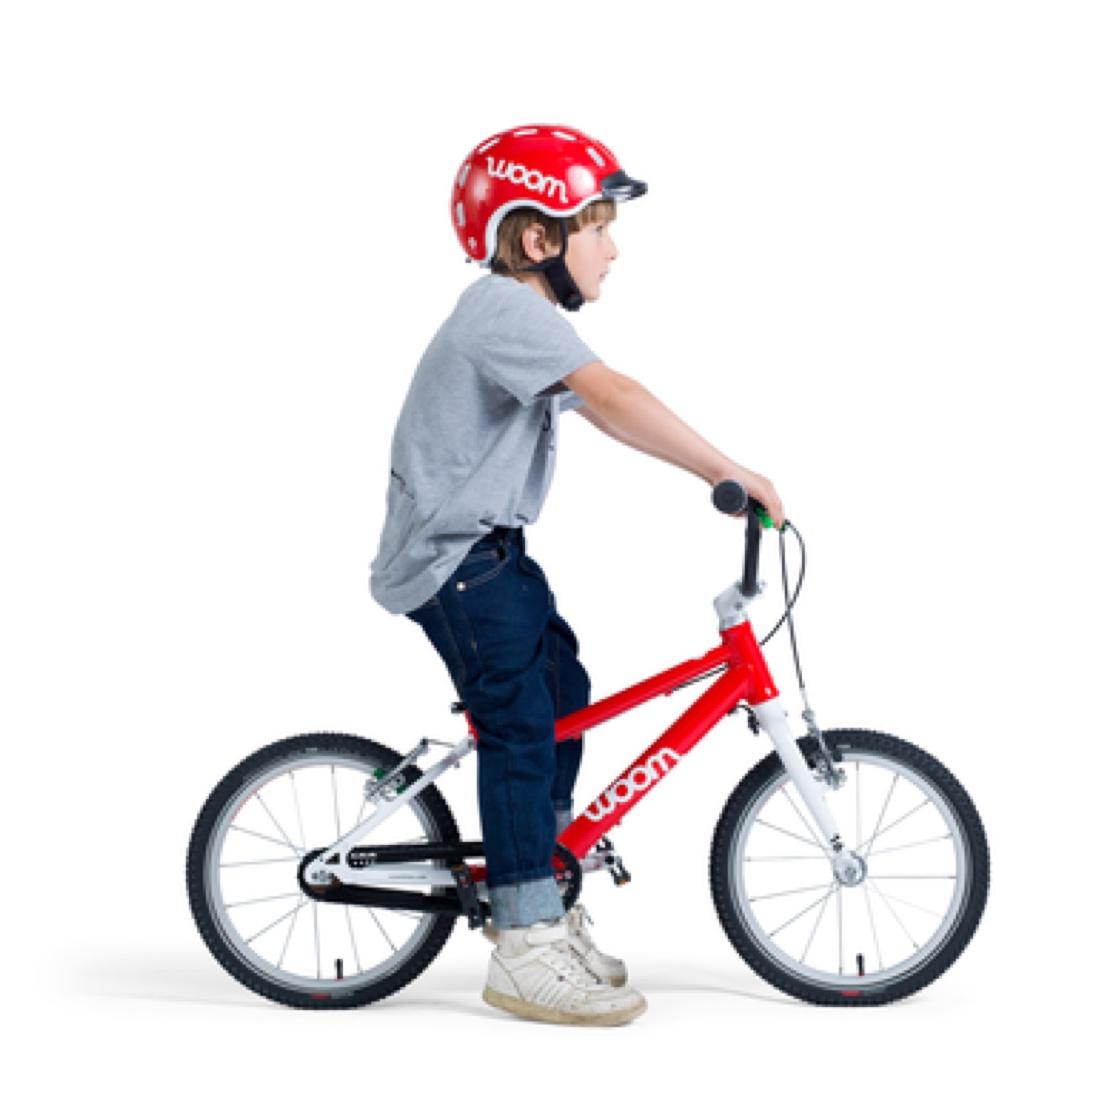 bike posture siting